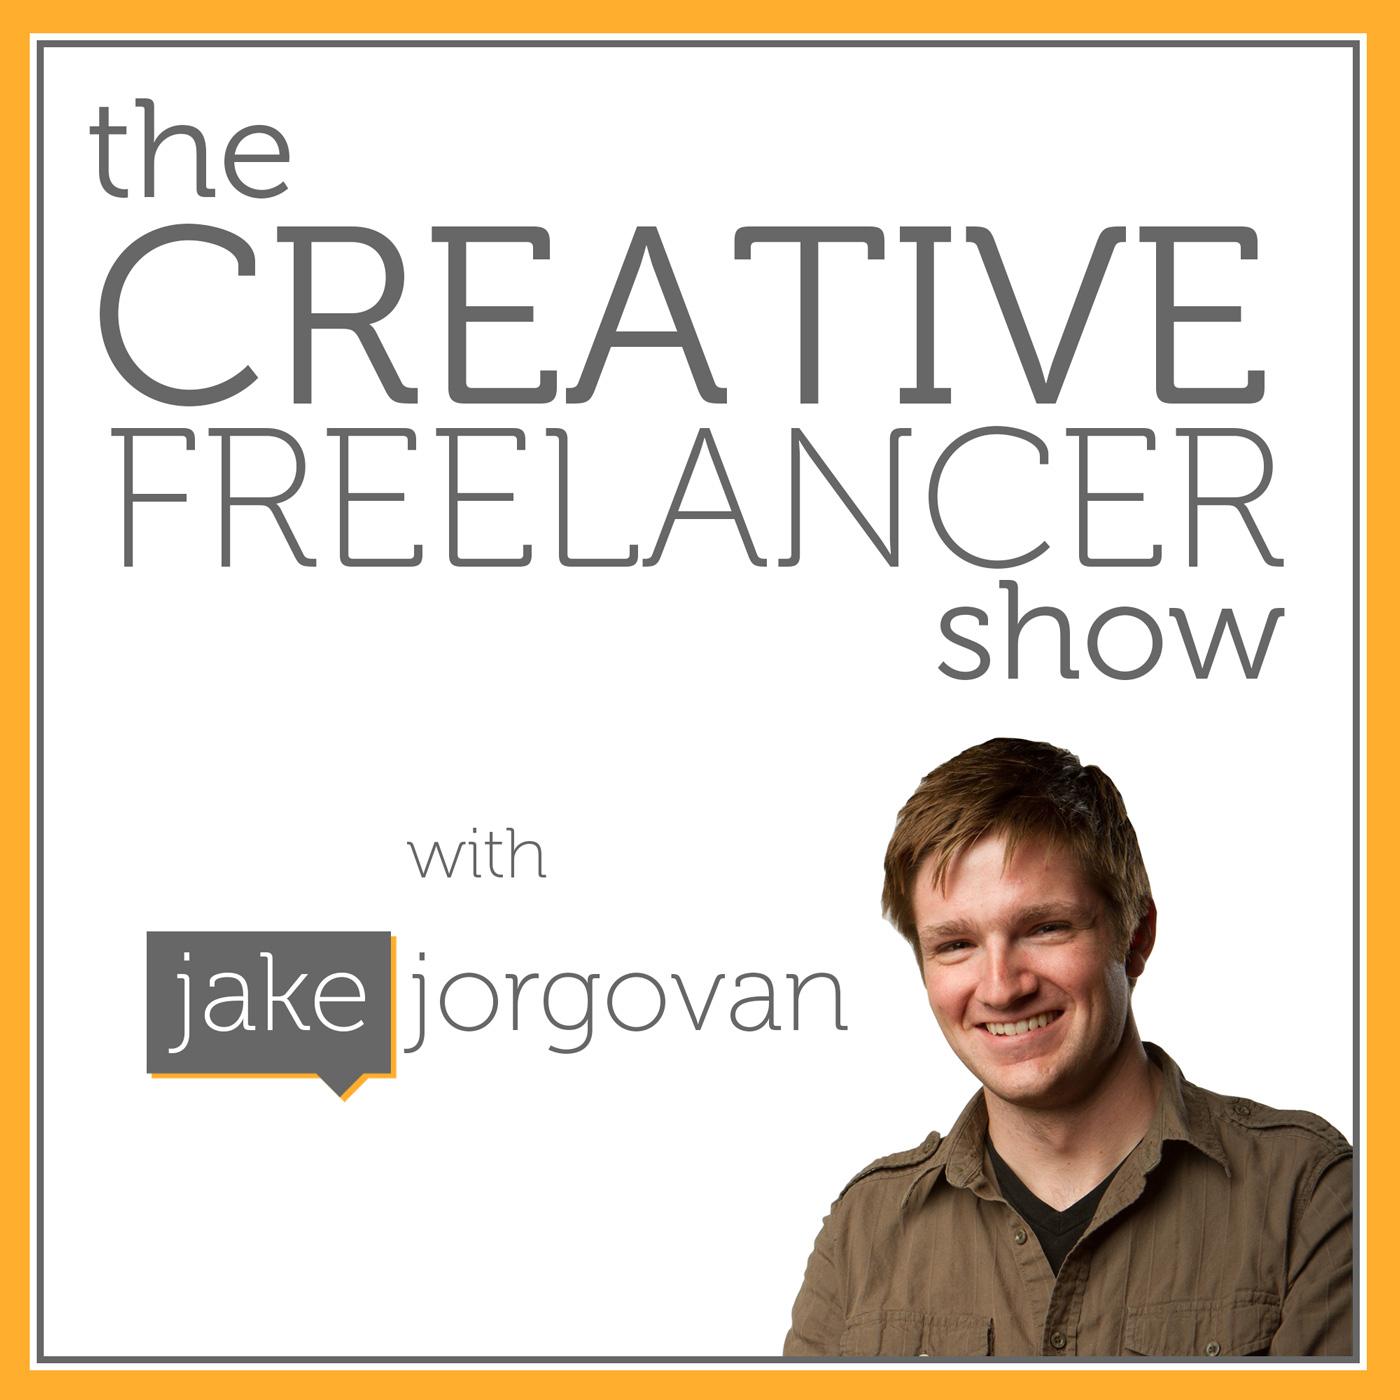 002: Why freelancing